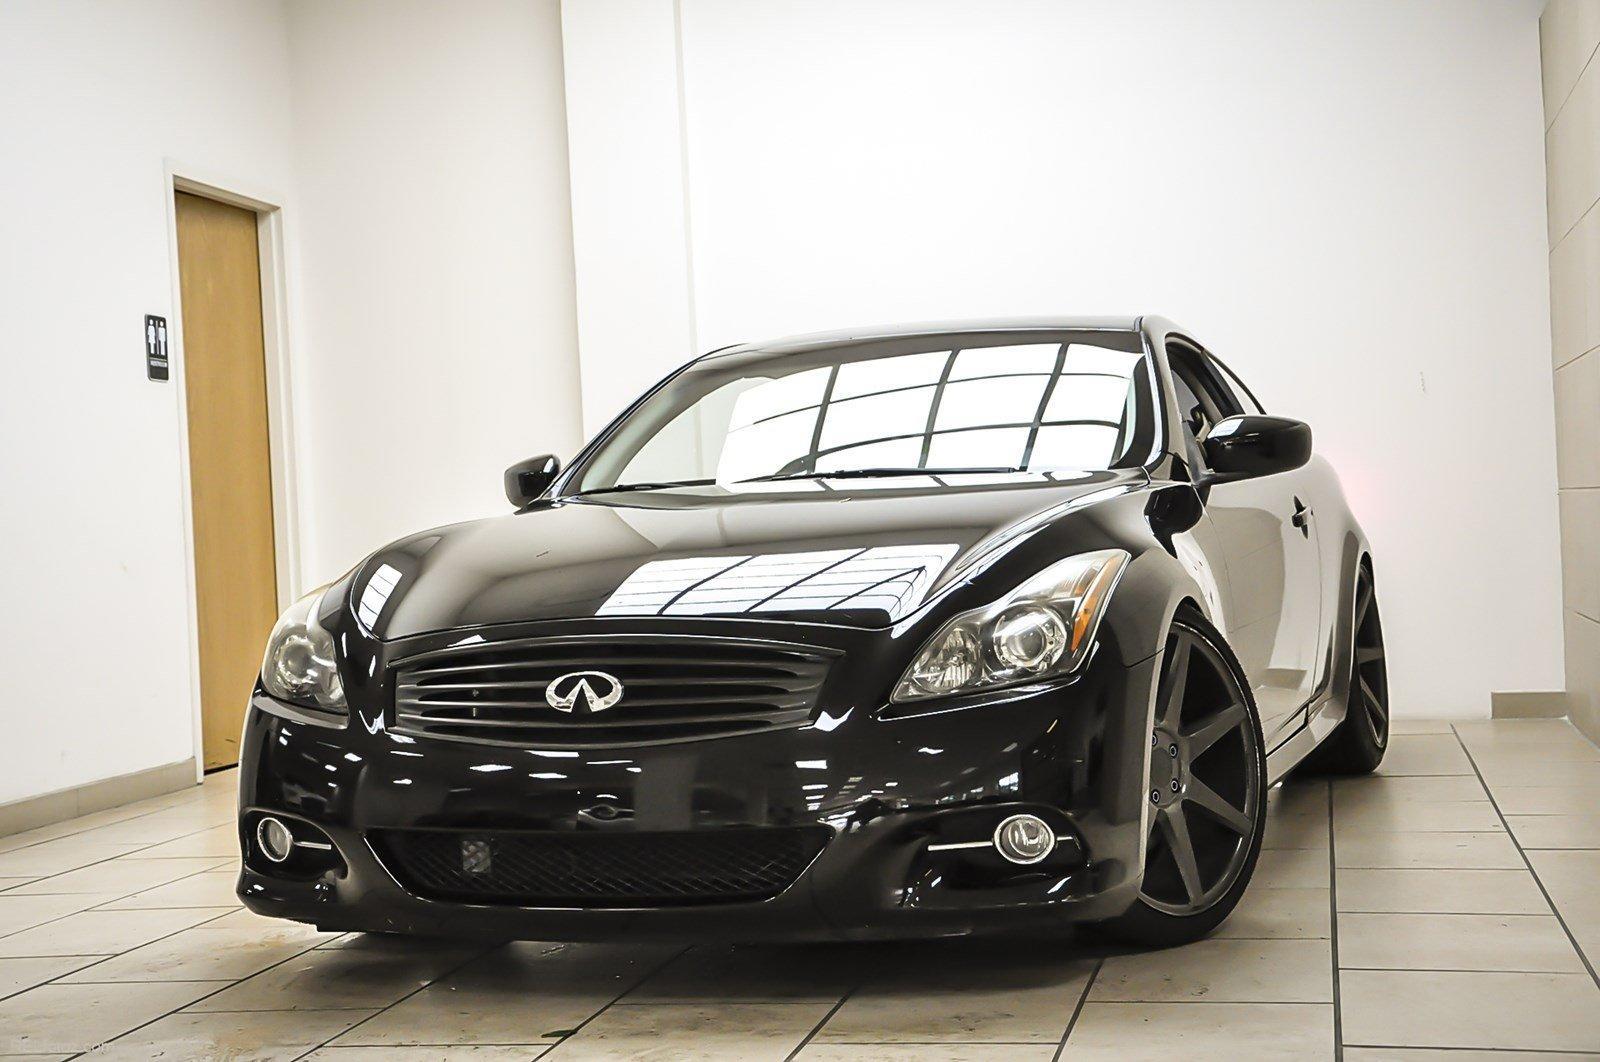 2012 Infiniti G37 Coupe Journey Stock 422033 For Sale Near Sandy Springs Ga Ga Infiniti Dealer